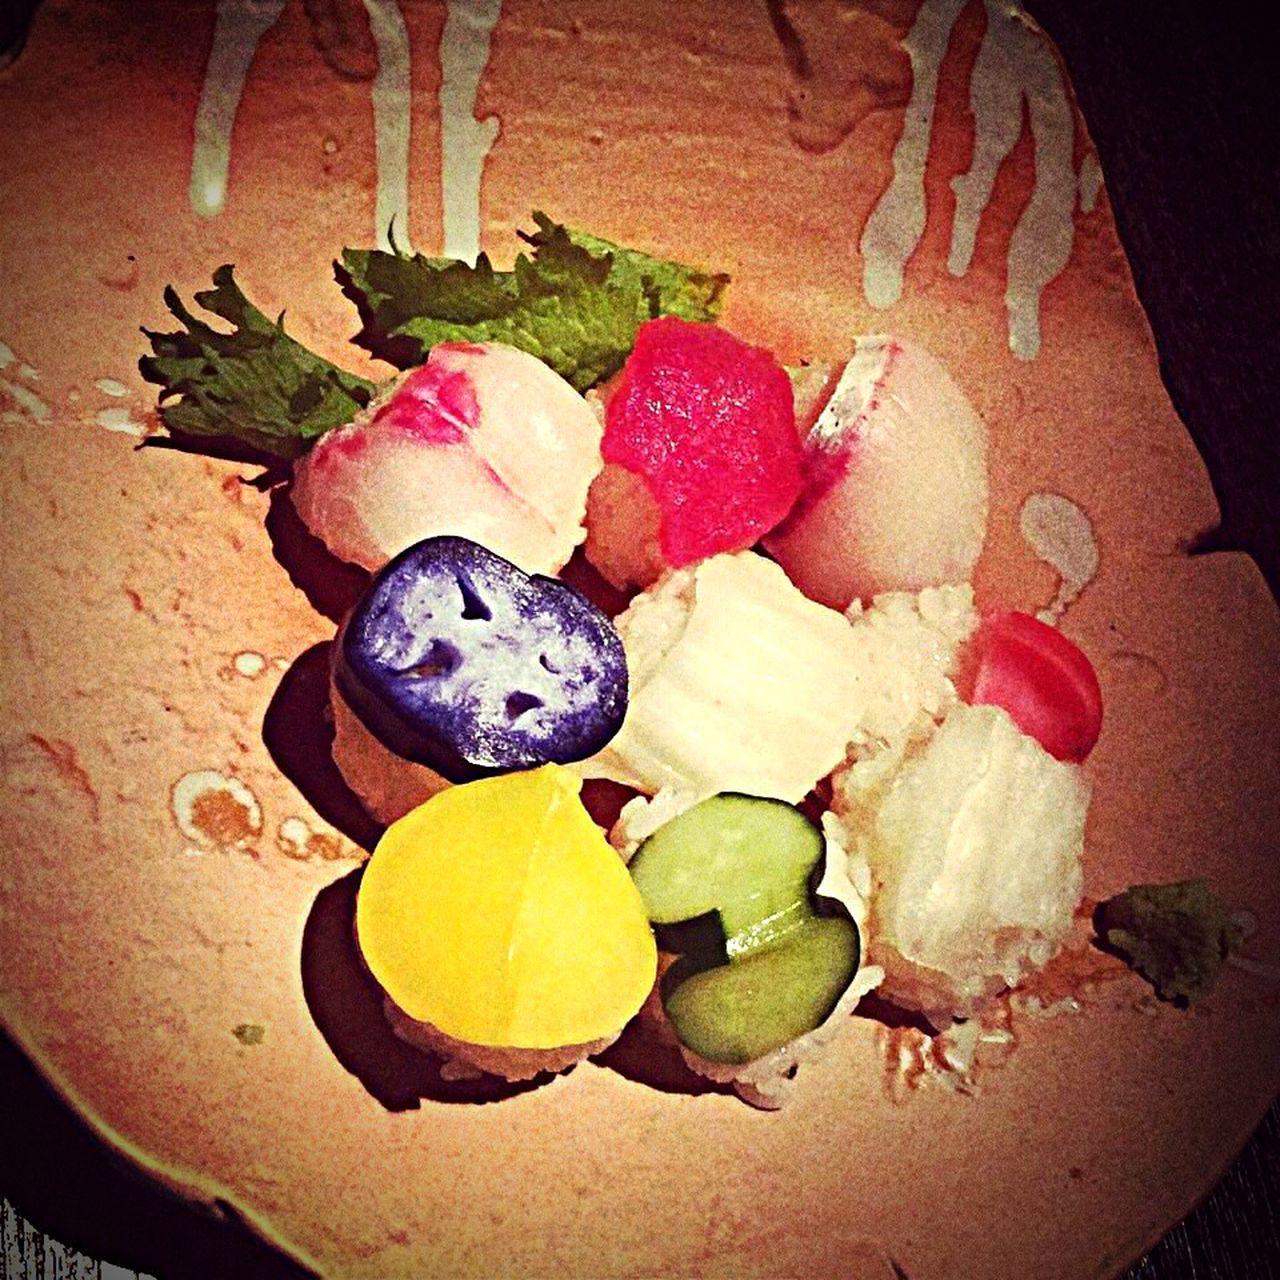 Japan Kyoto Sushi Temari Temarizushi Culture